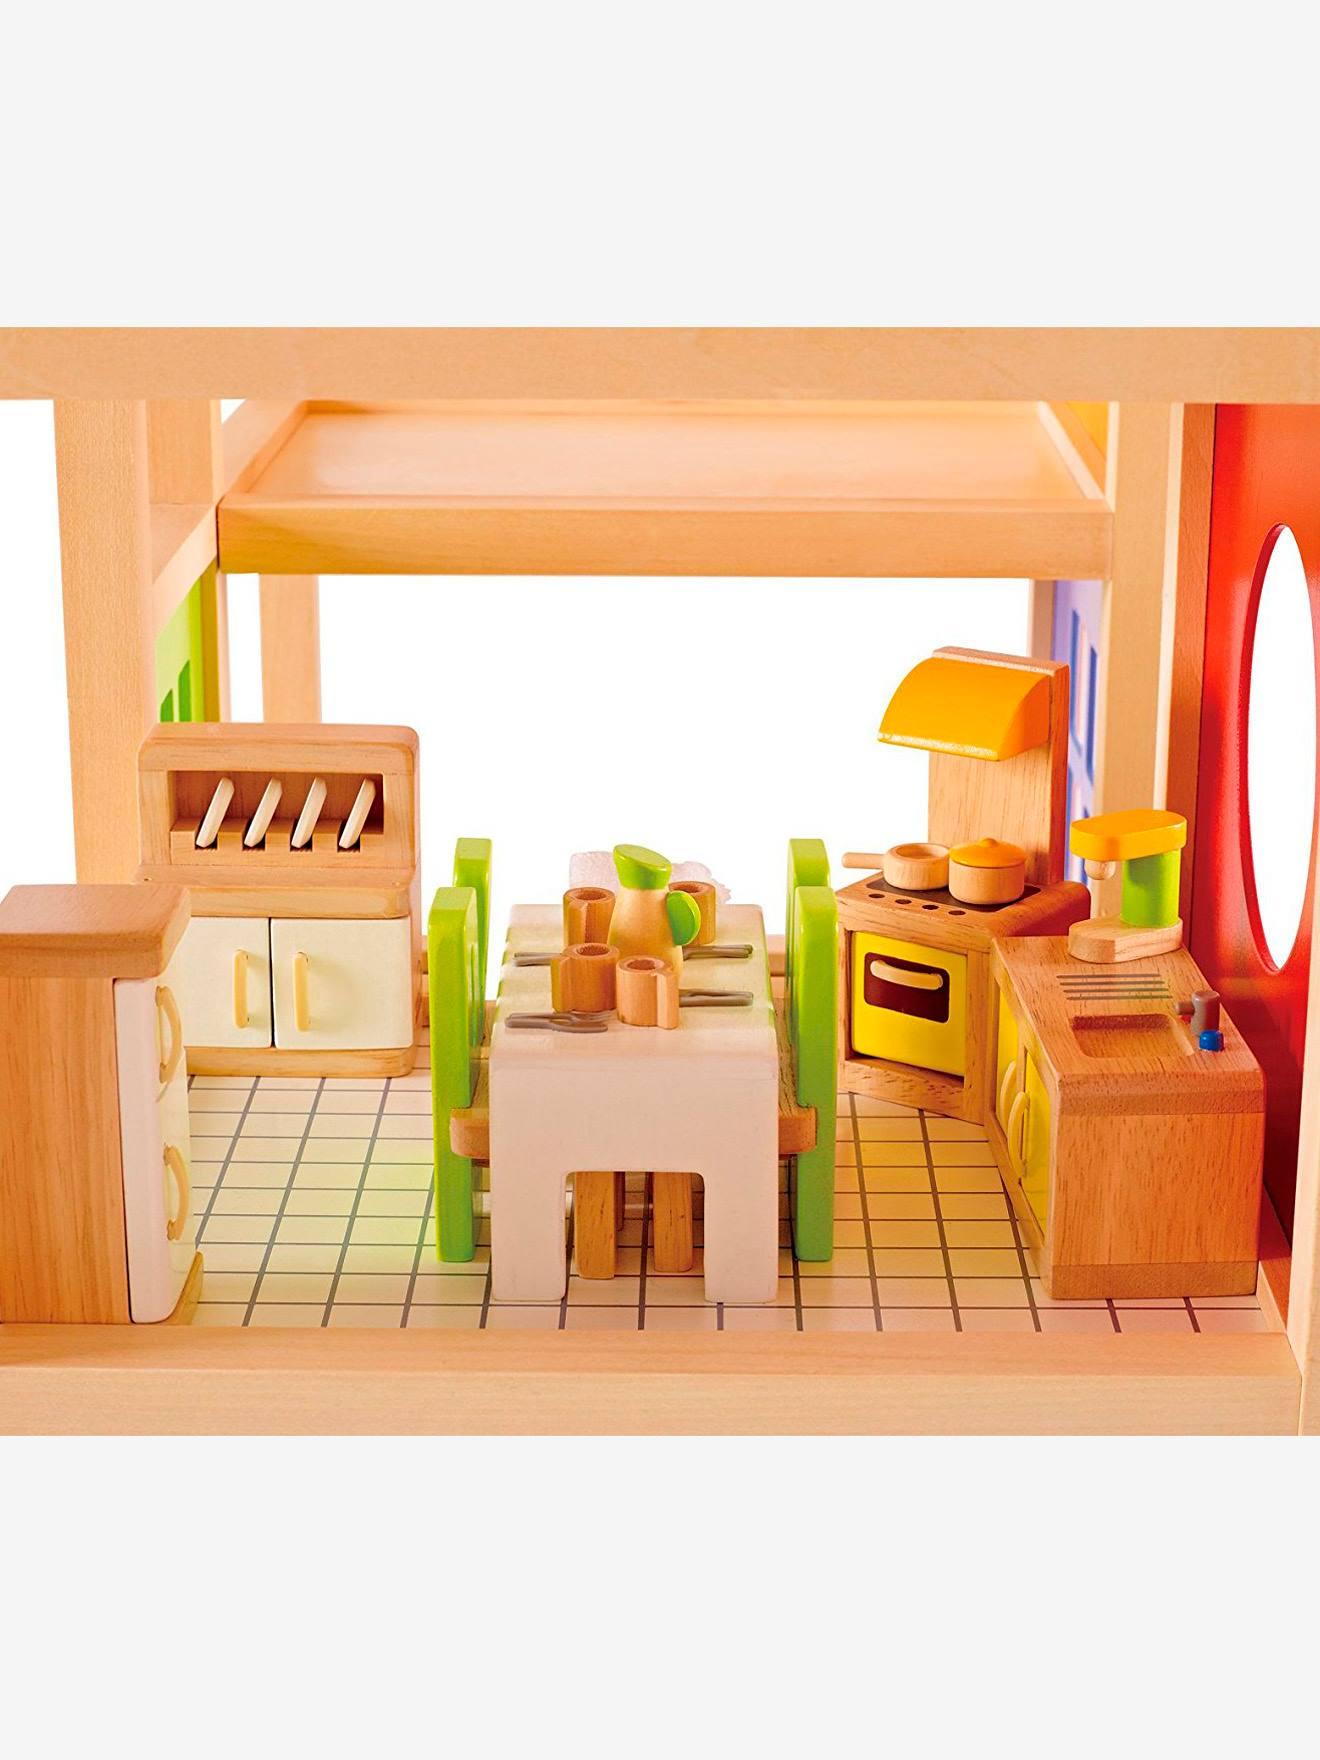 Cuisine enfant vertbaudet cuisine en bois hape - Vertbaudet cuisine en bois ...